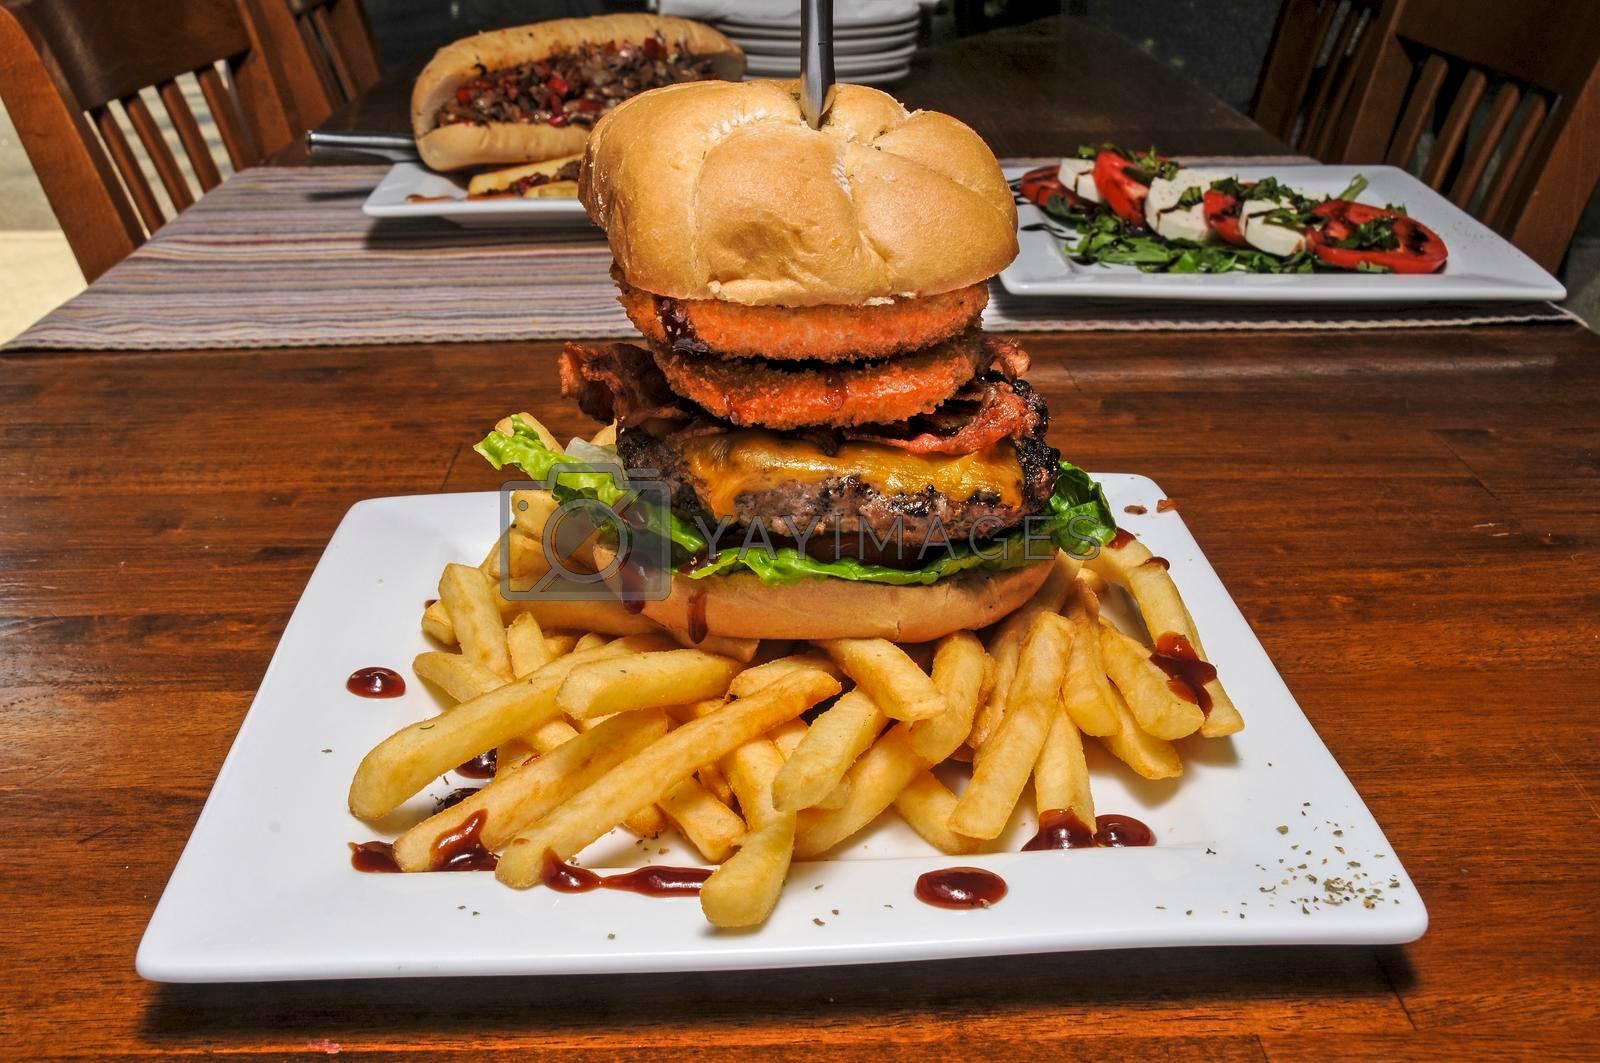 Delicious cheeseburger known as an onion ring cowboy burger